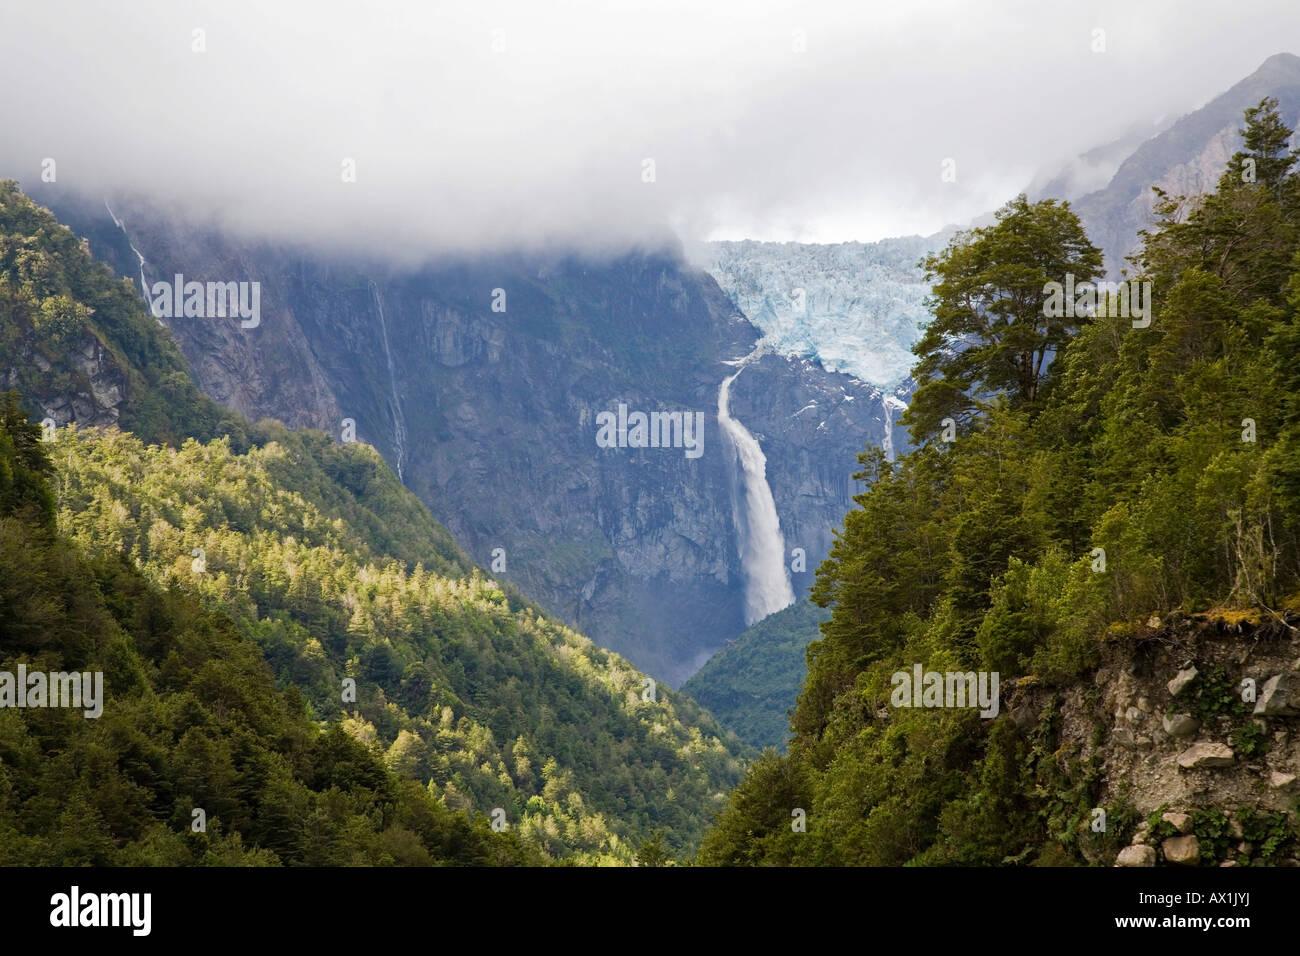 Glacier Ventisquero Colgante, Park Queulat, Carretera Austral, Patagonia, Chile, South America - Stock Image